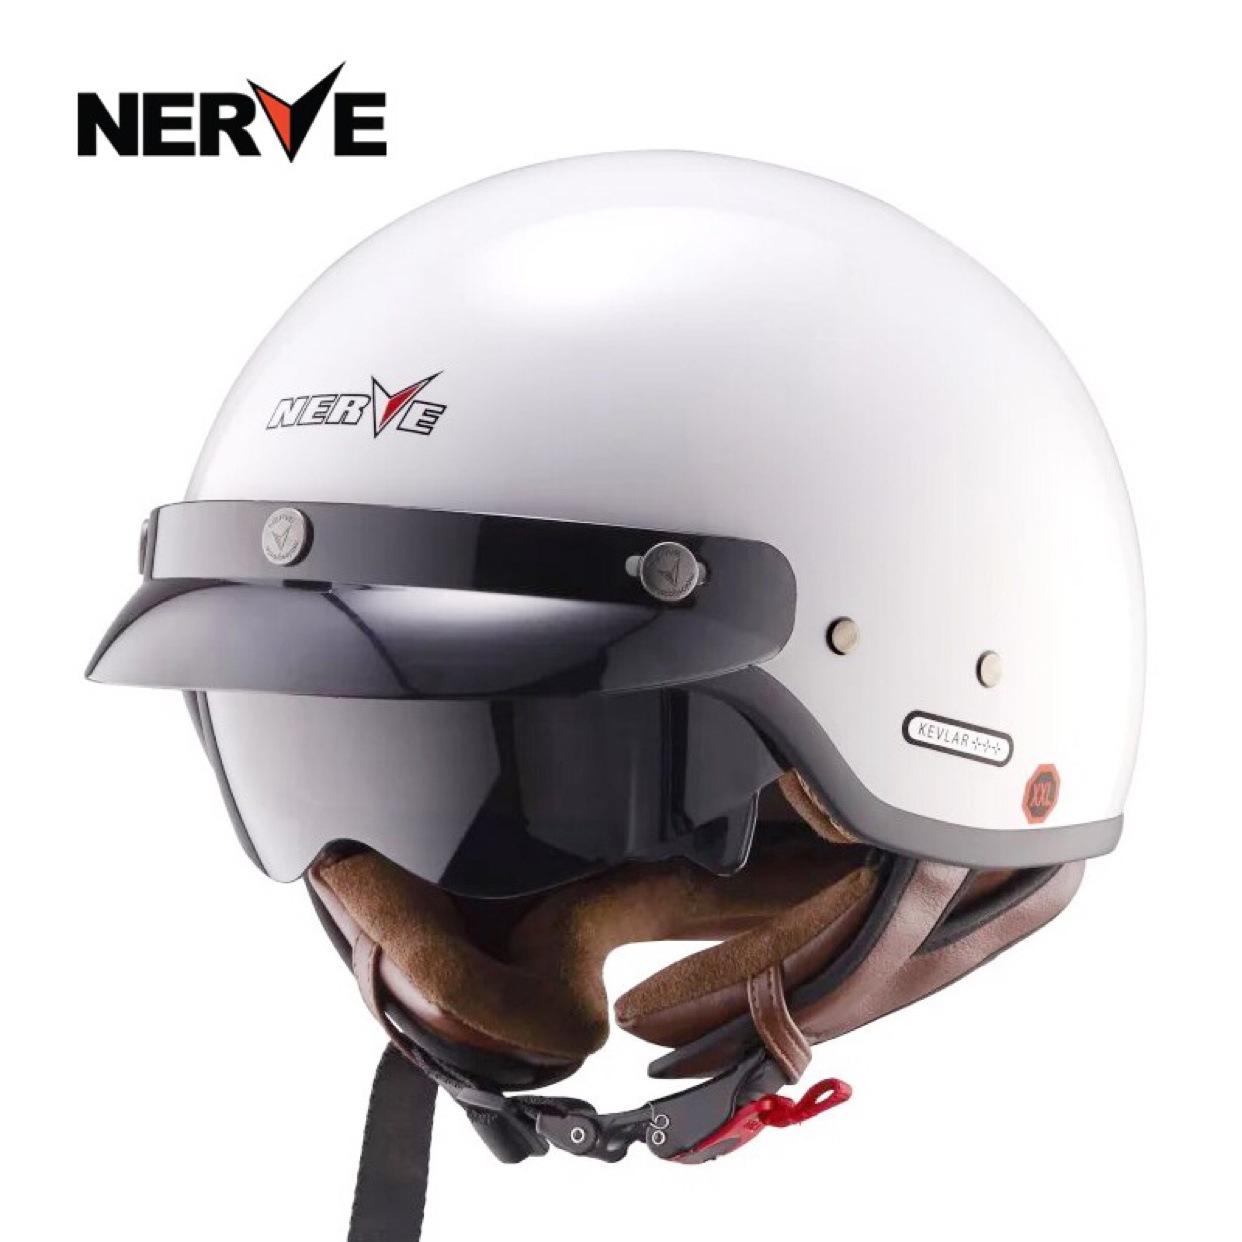 NERVE凯芙拉碳纤维复古半盔覆式时尚夏季个性摩托车头盔男女四季